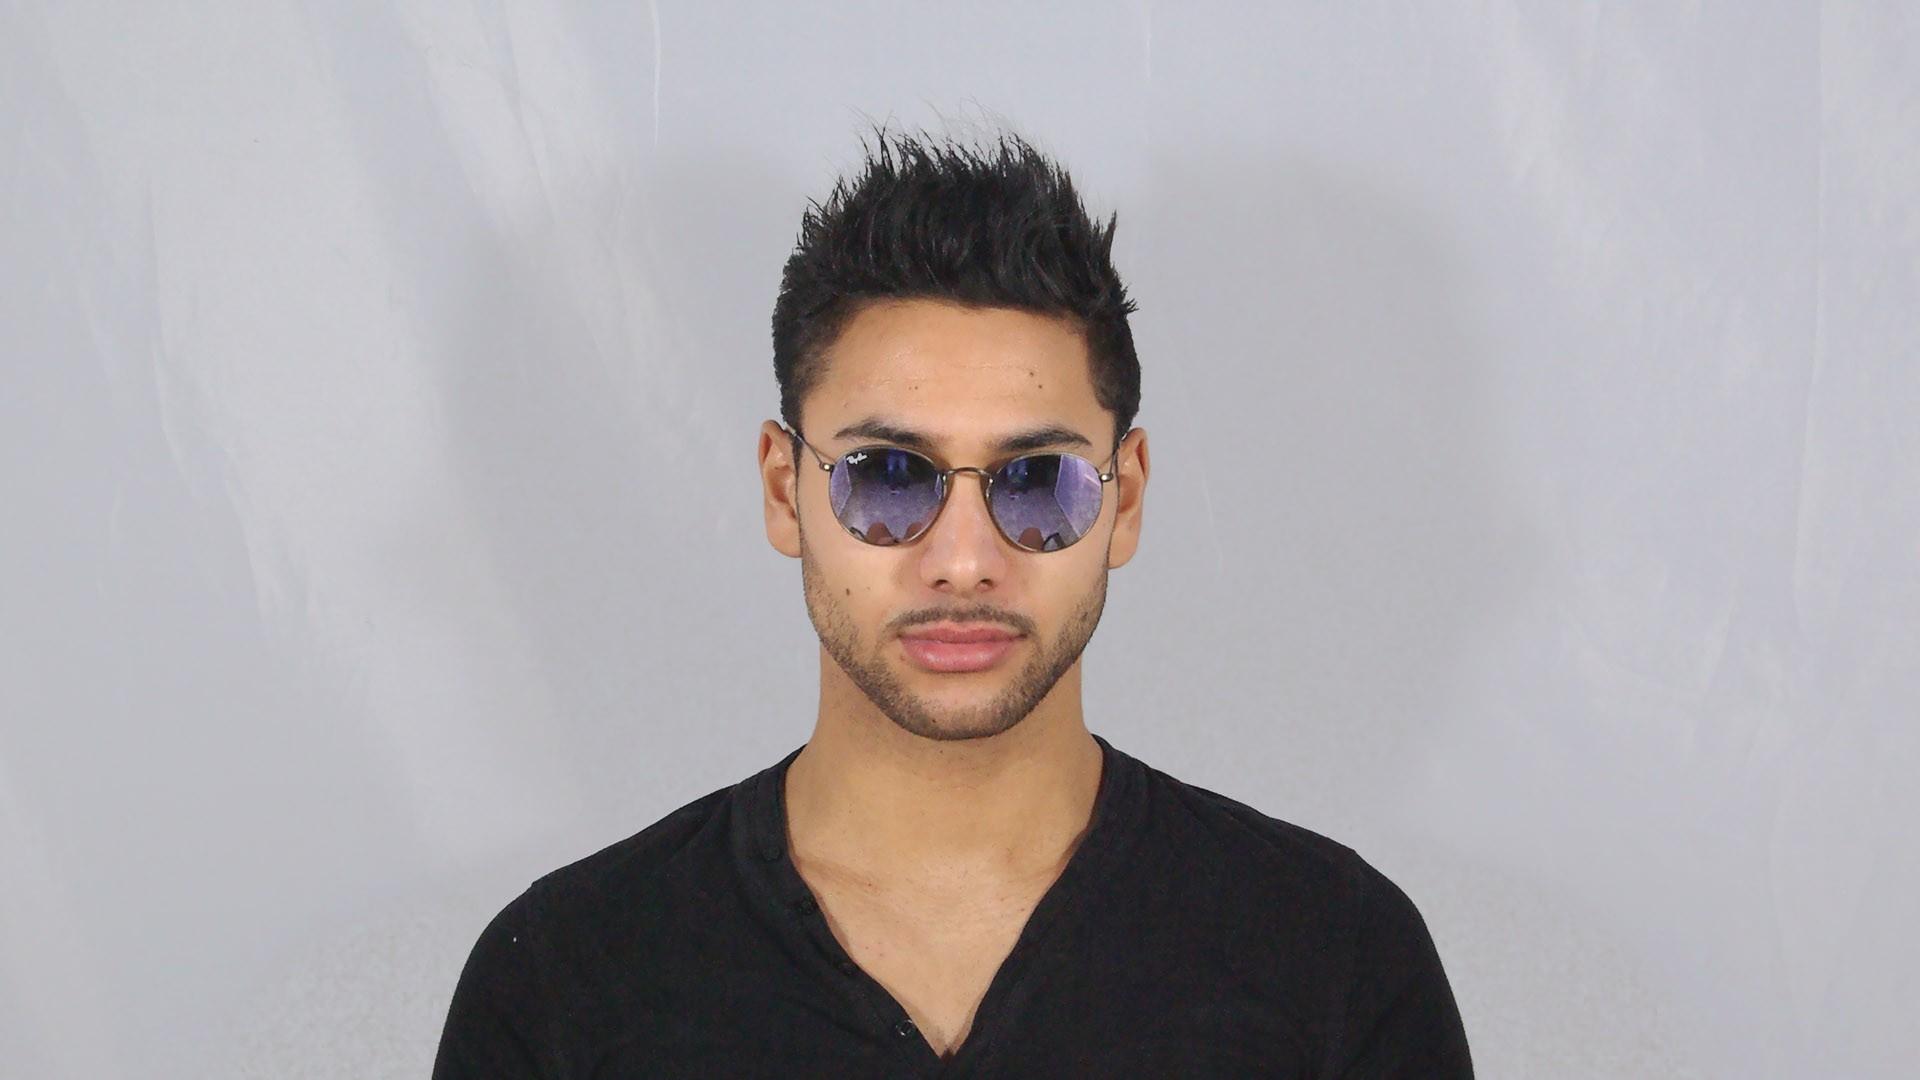 d80fee811e4 Sunglasses Ray-Ban Round Metal Brown Flash Lenses RB3447 167 4K 50-21  Medium Mirror